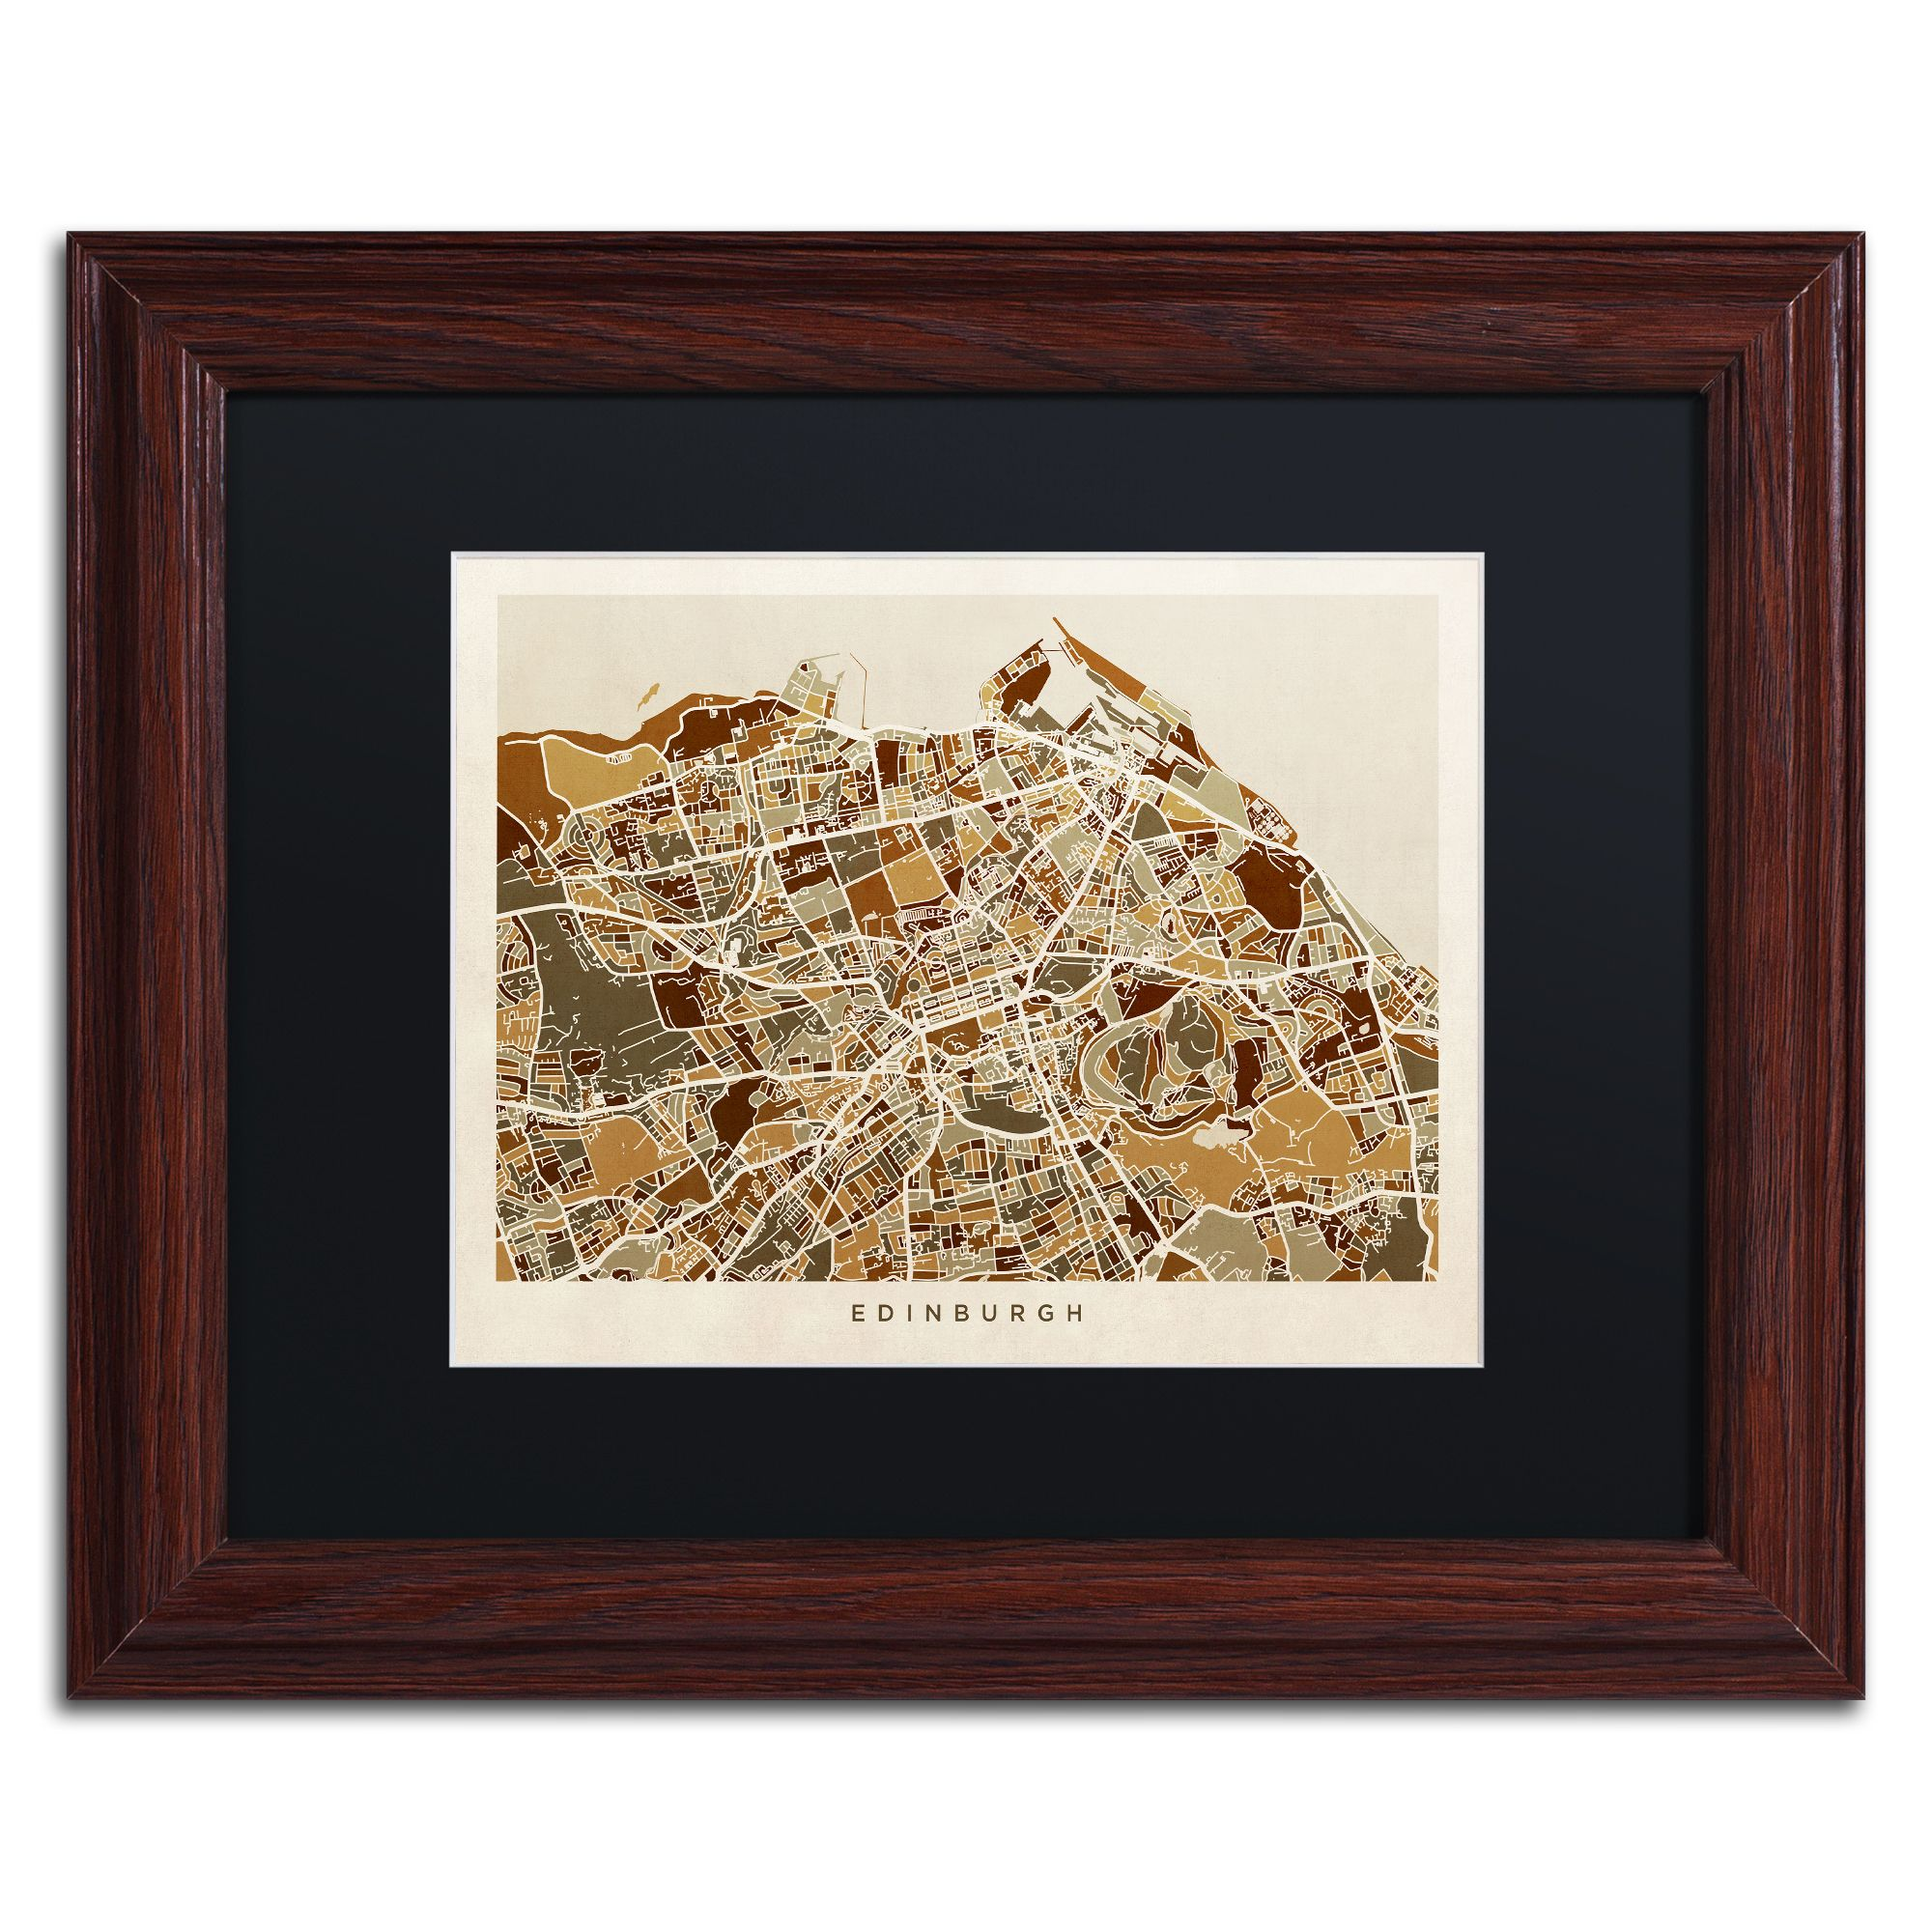 michael tompsett edinburgh street map ii matte wood framed canvas - Wood Frames For Canvas